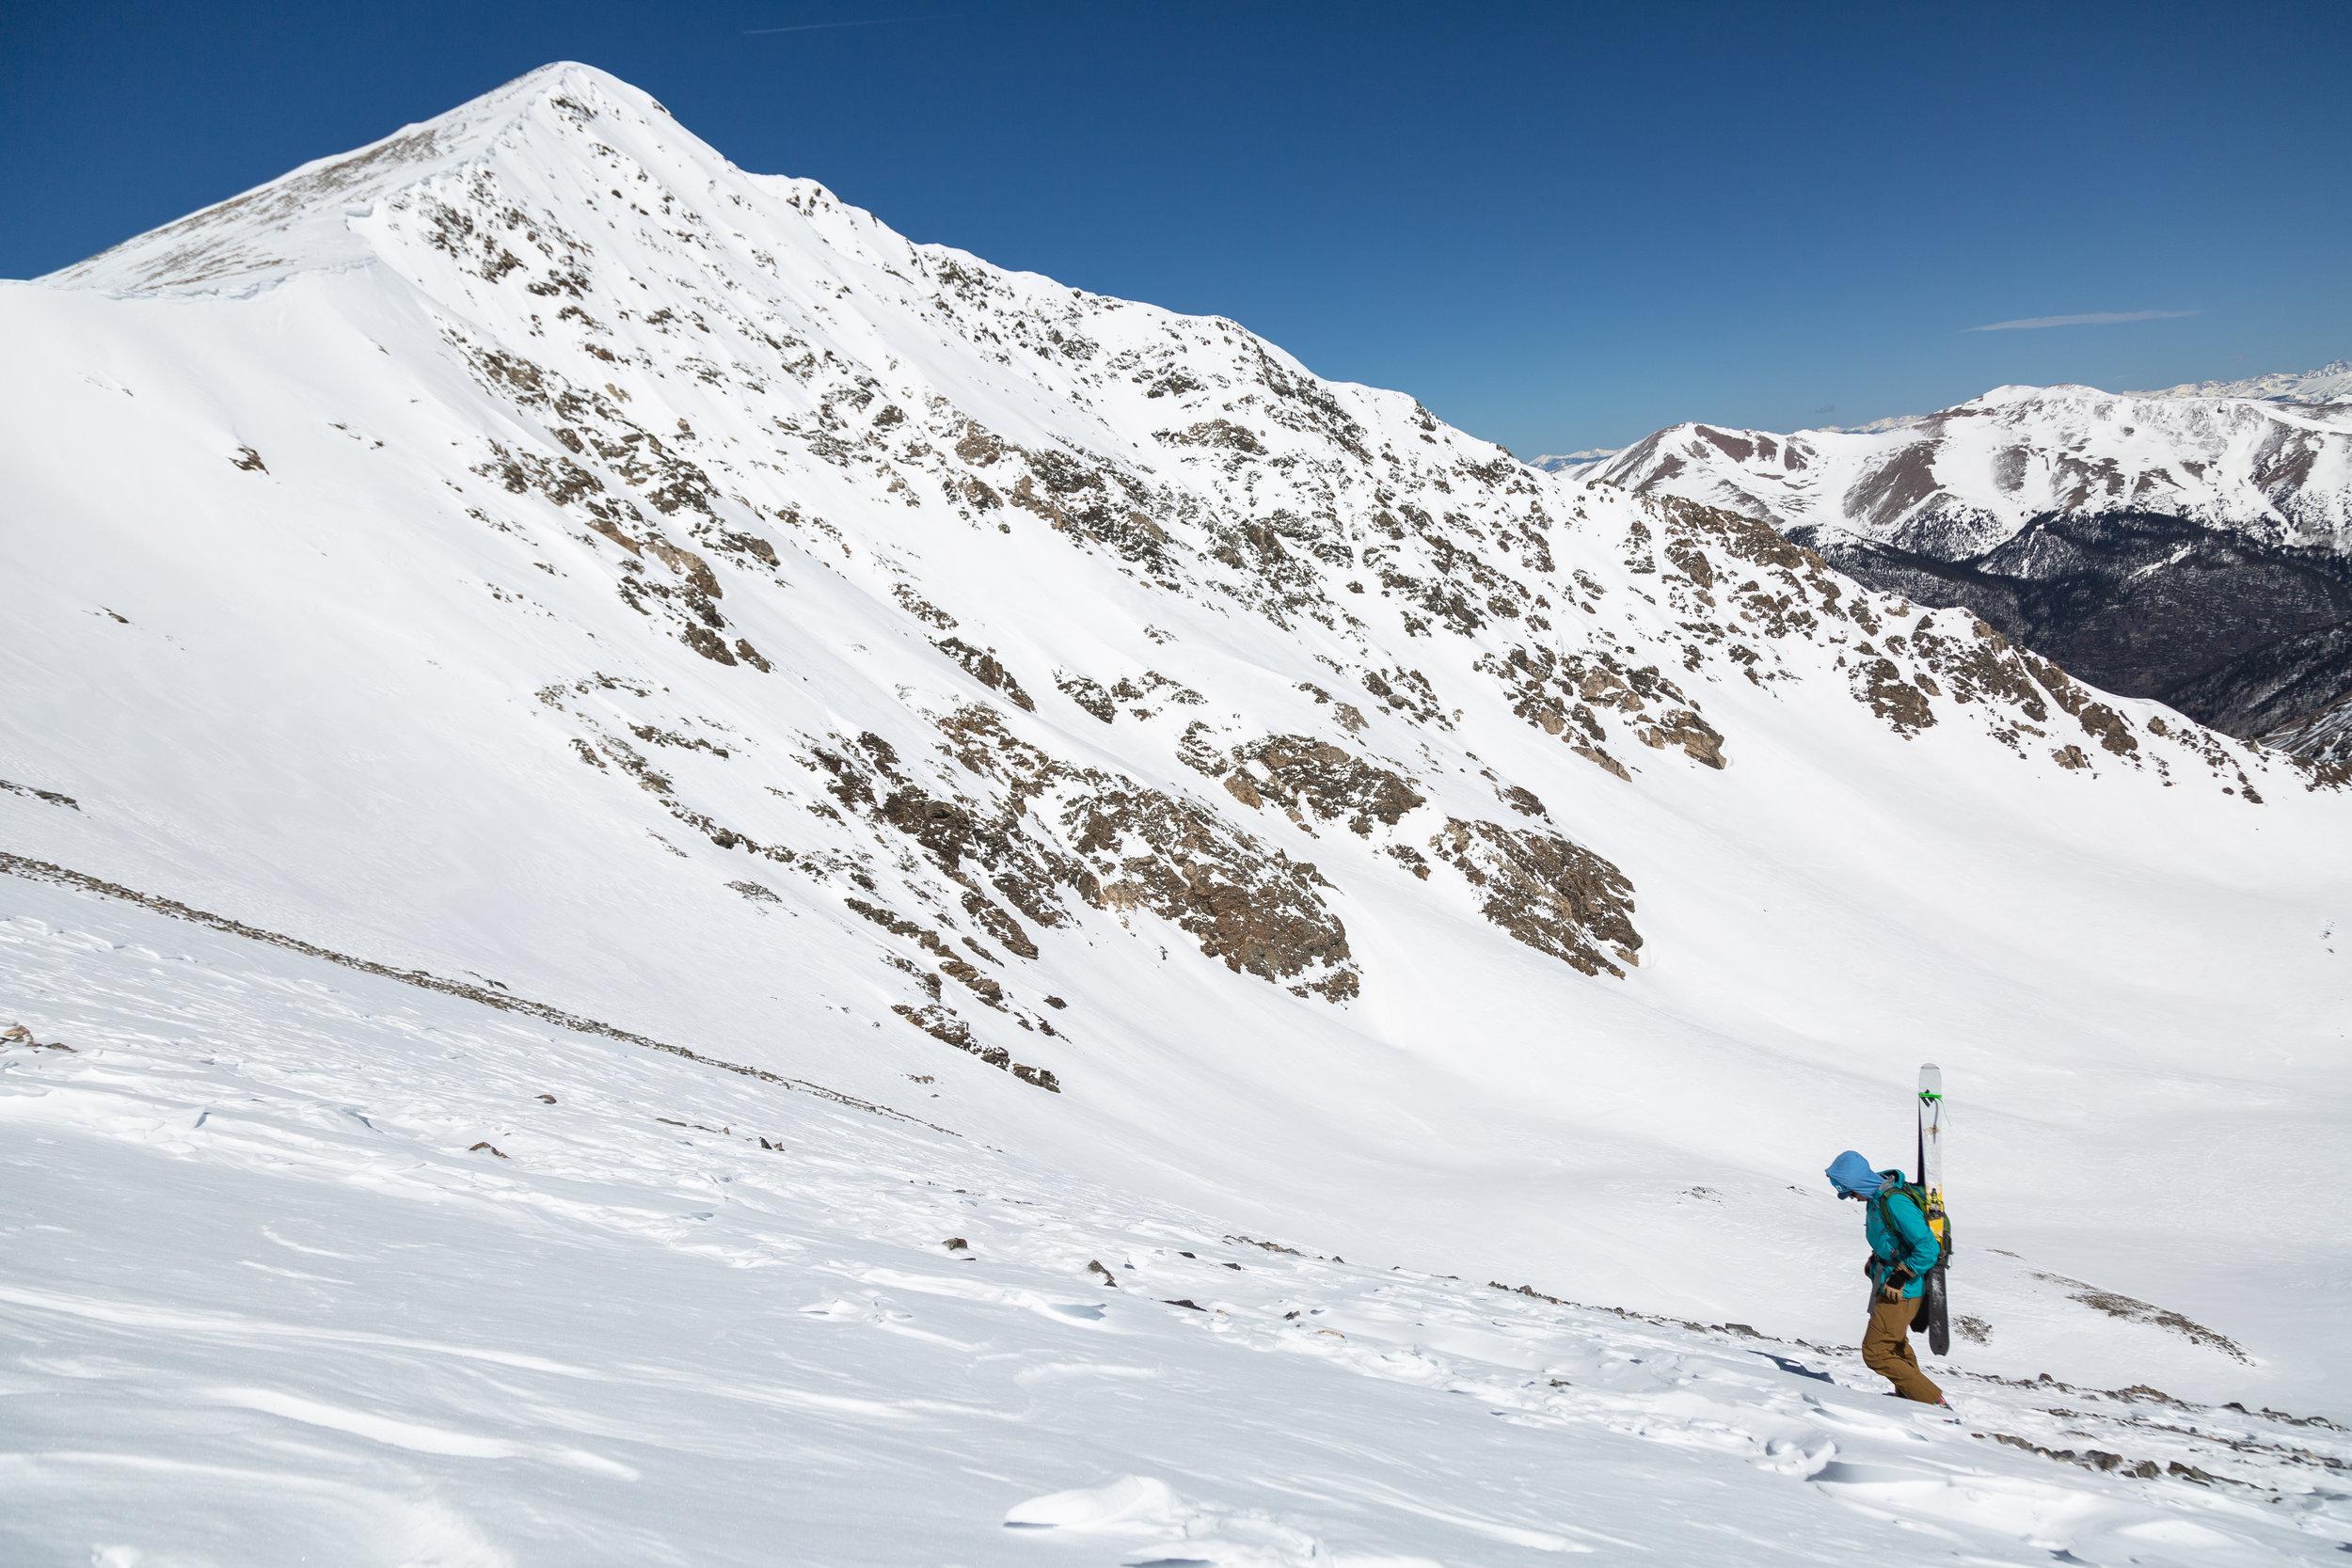 JTG_Skiing-5.jpg